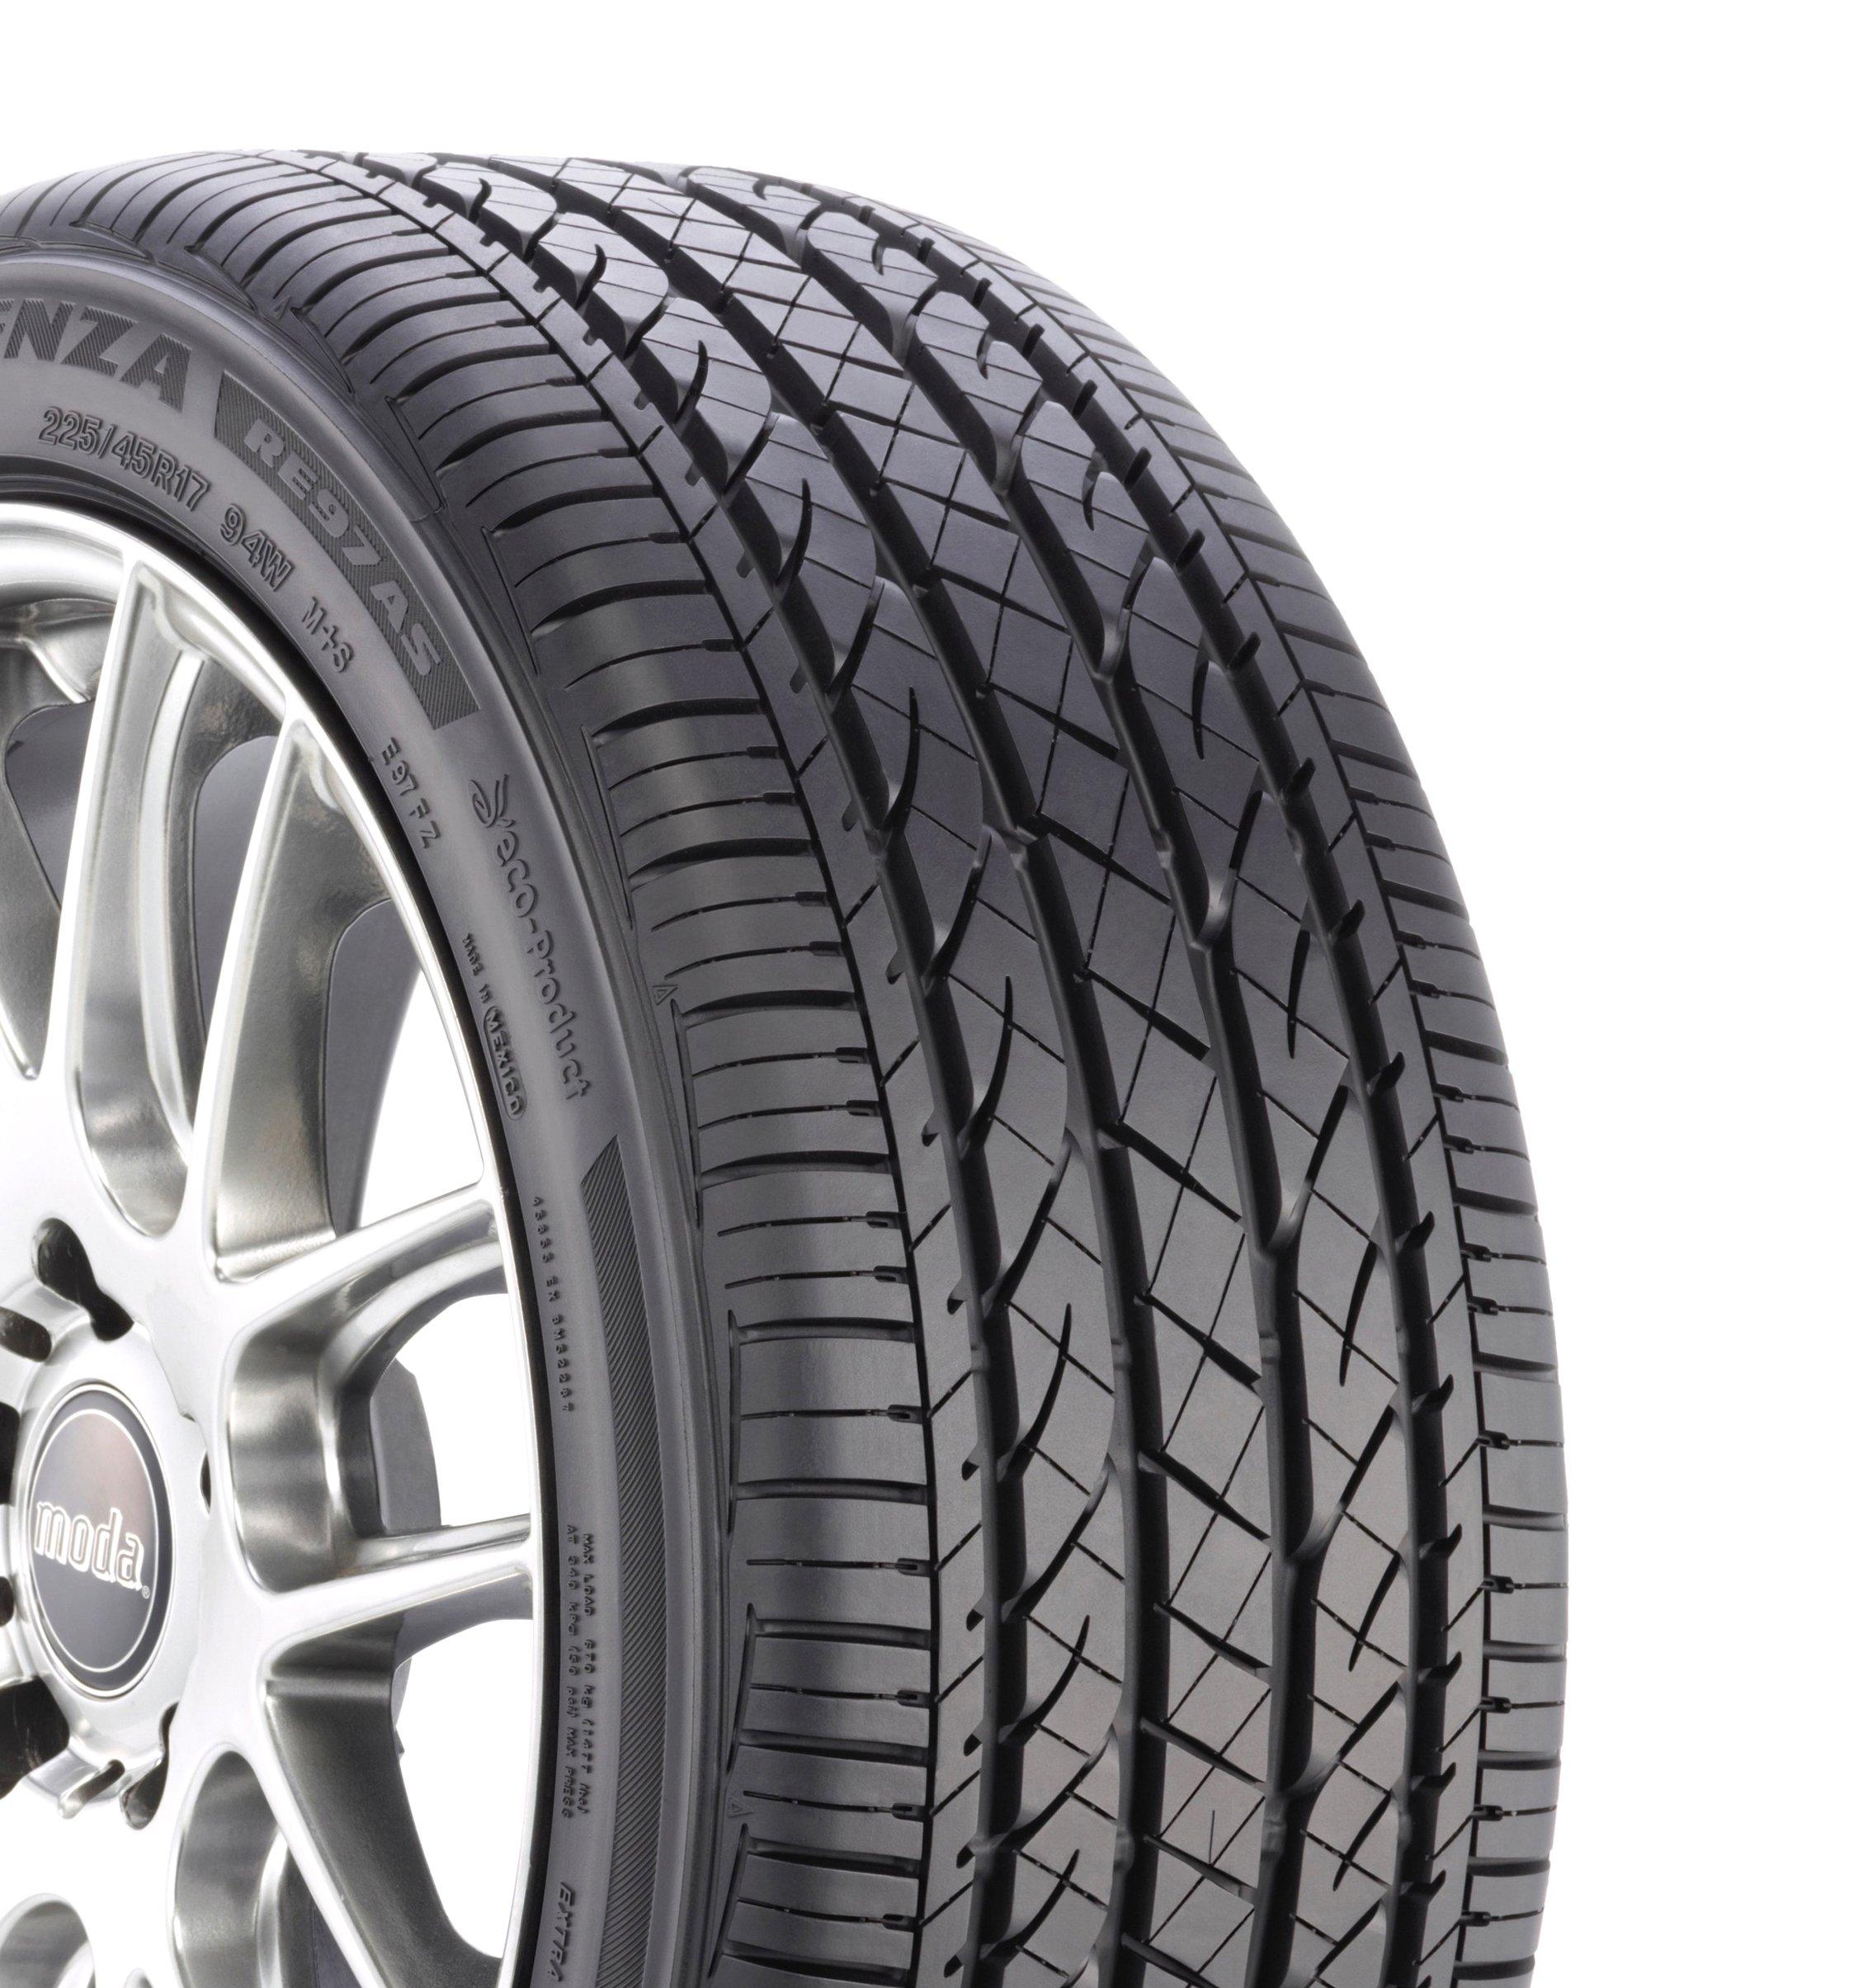 Bridgestone Potenza RE97AS Performance Radial Tire - 215/45R17 91W